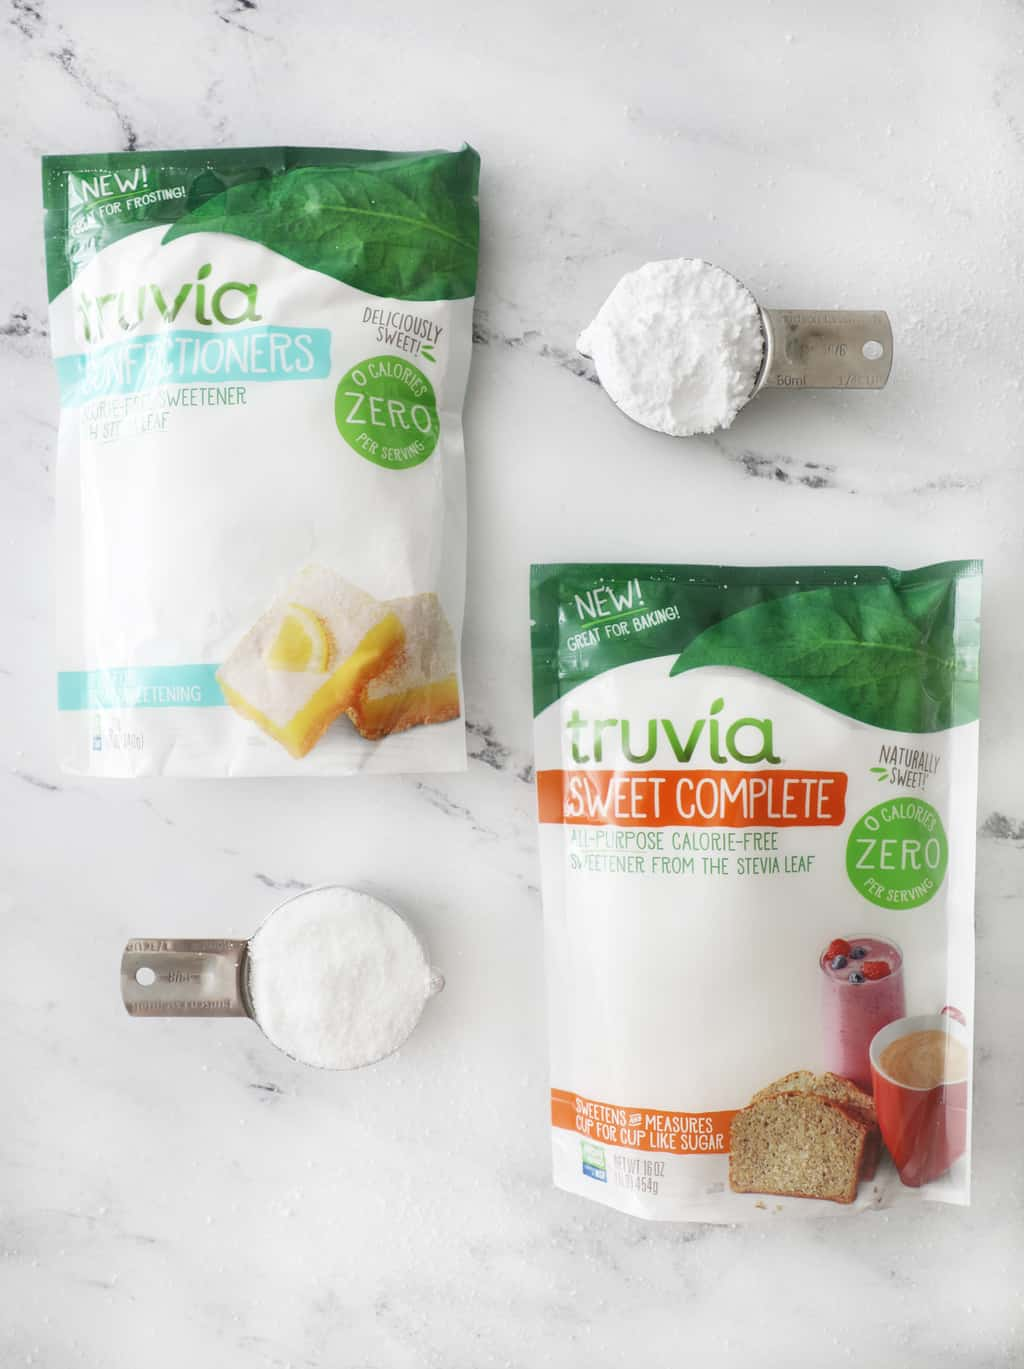 Truvia Sweet Complete compared to Truvia Confectioners